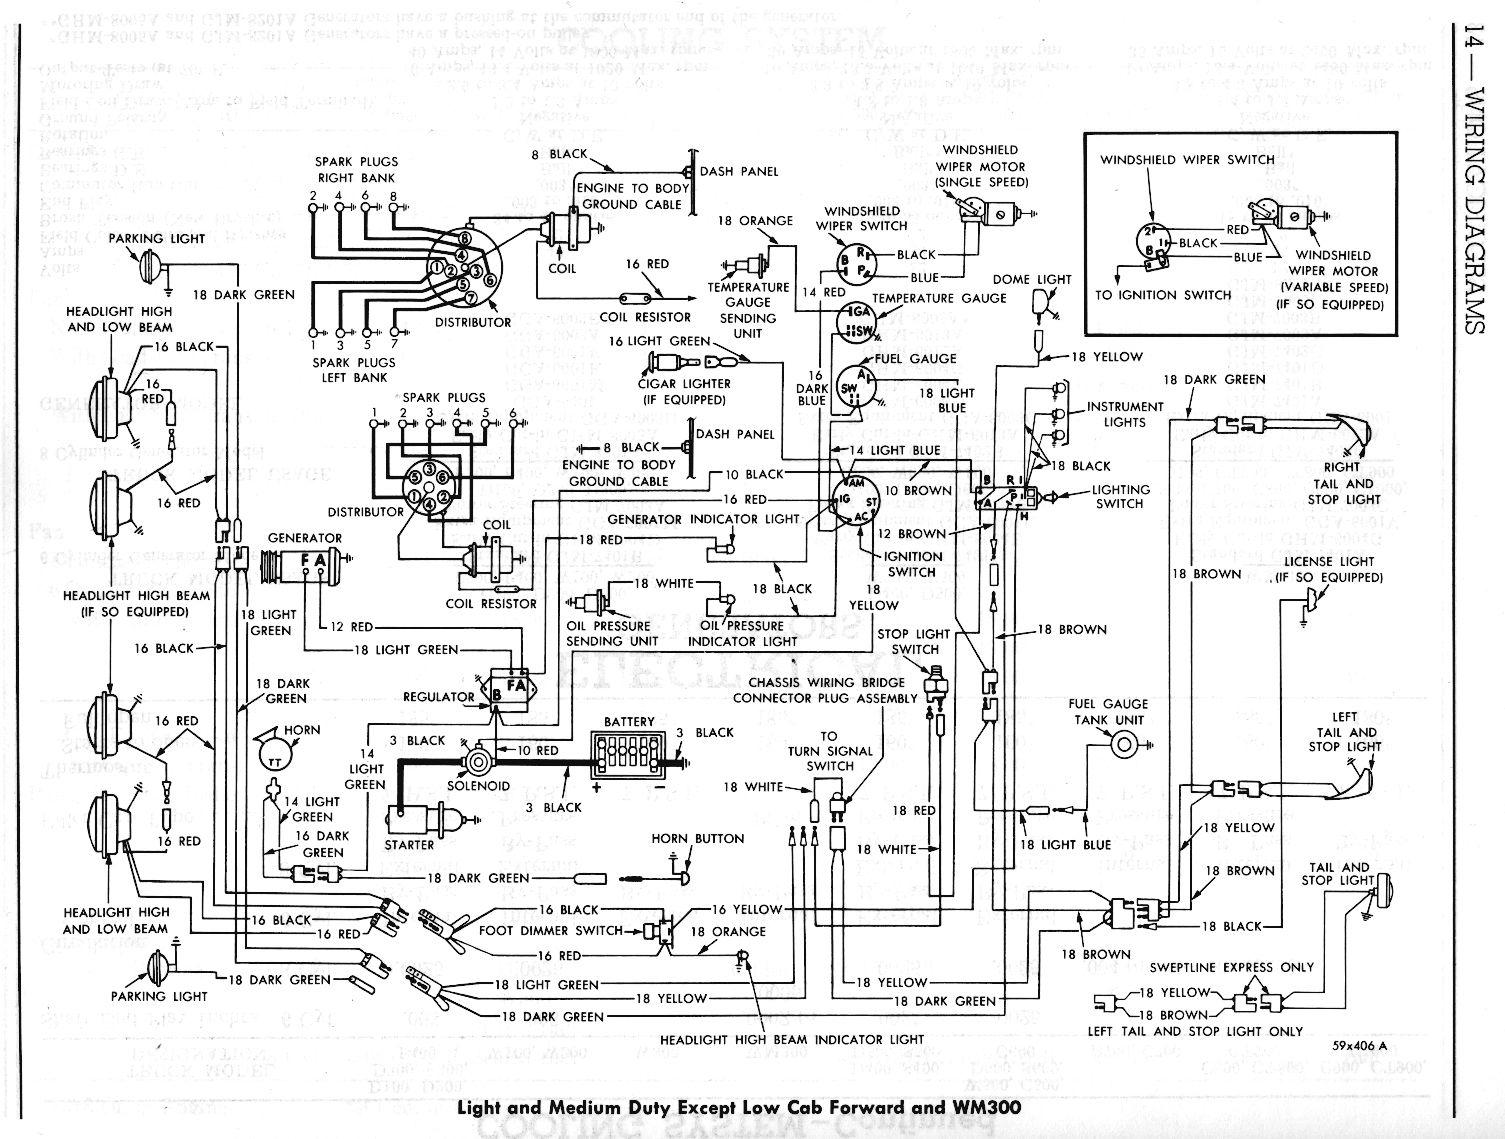 d2 ballast wiring diagram denso [ 1505 x 1139 Pixel ]